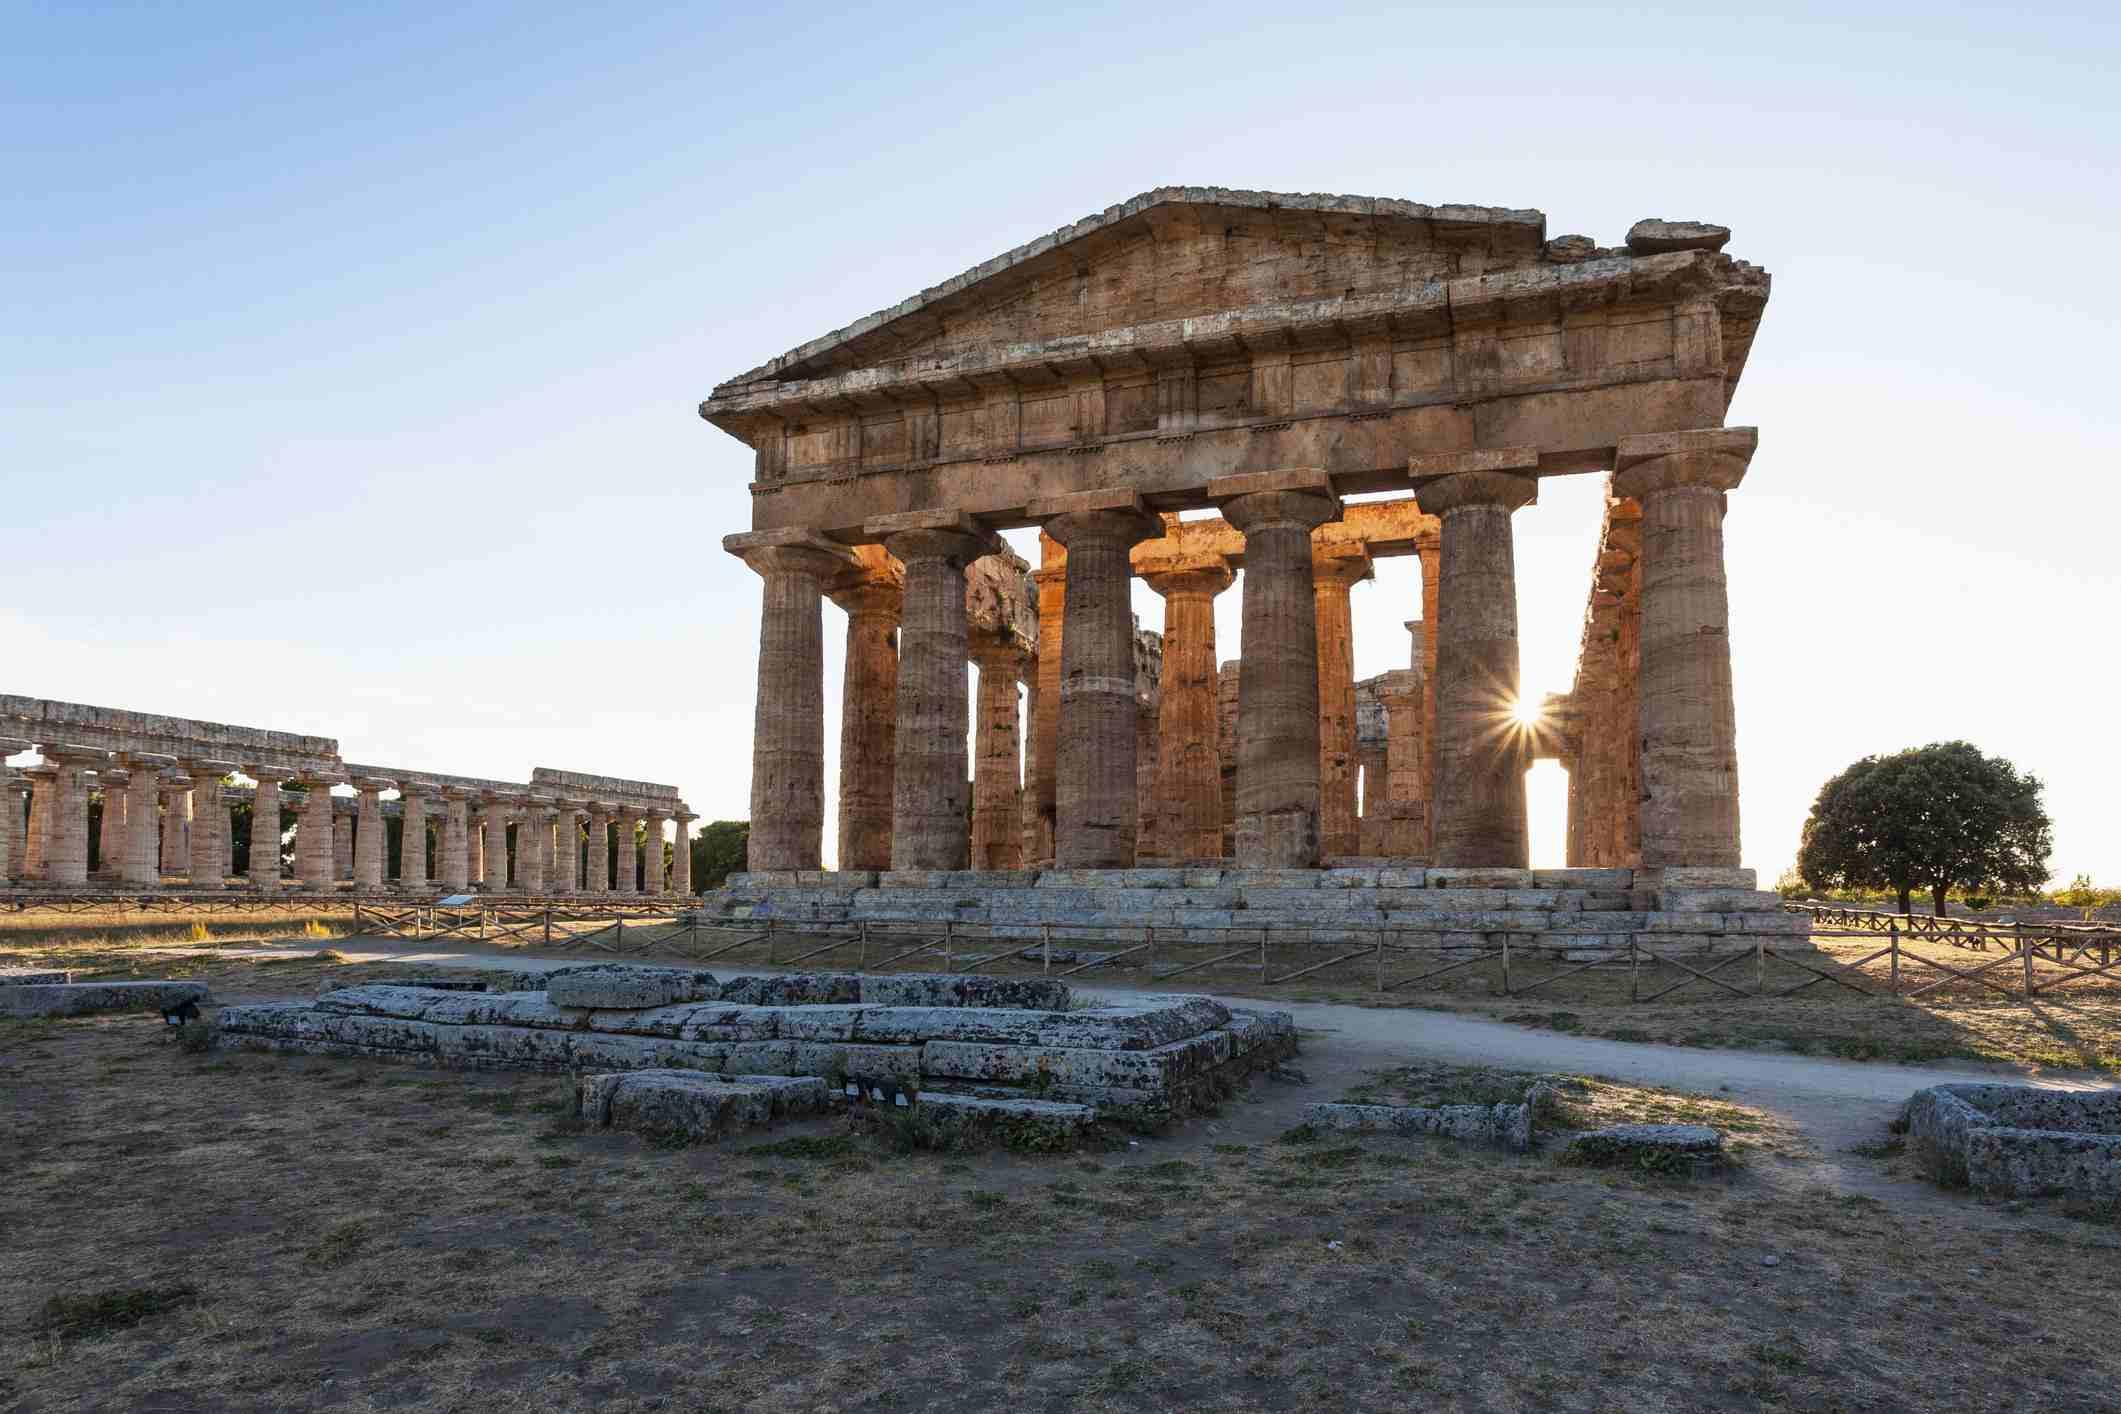 'Poseidon Temple at sunset, Neptune Temple, historic town of Paestum in the Gulf of Salerno, Capaccio, Campania, Italy, Europe'